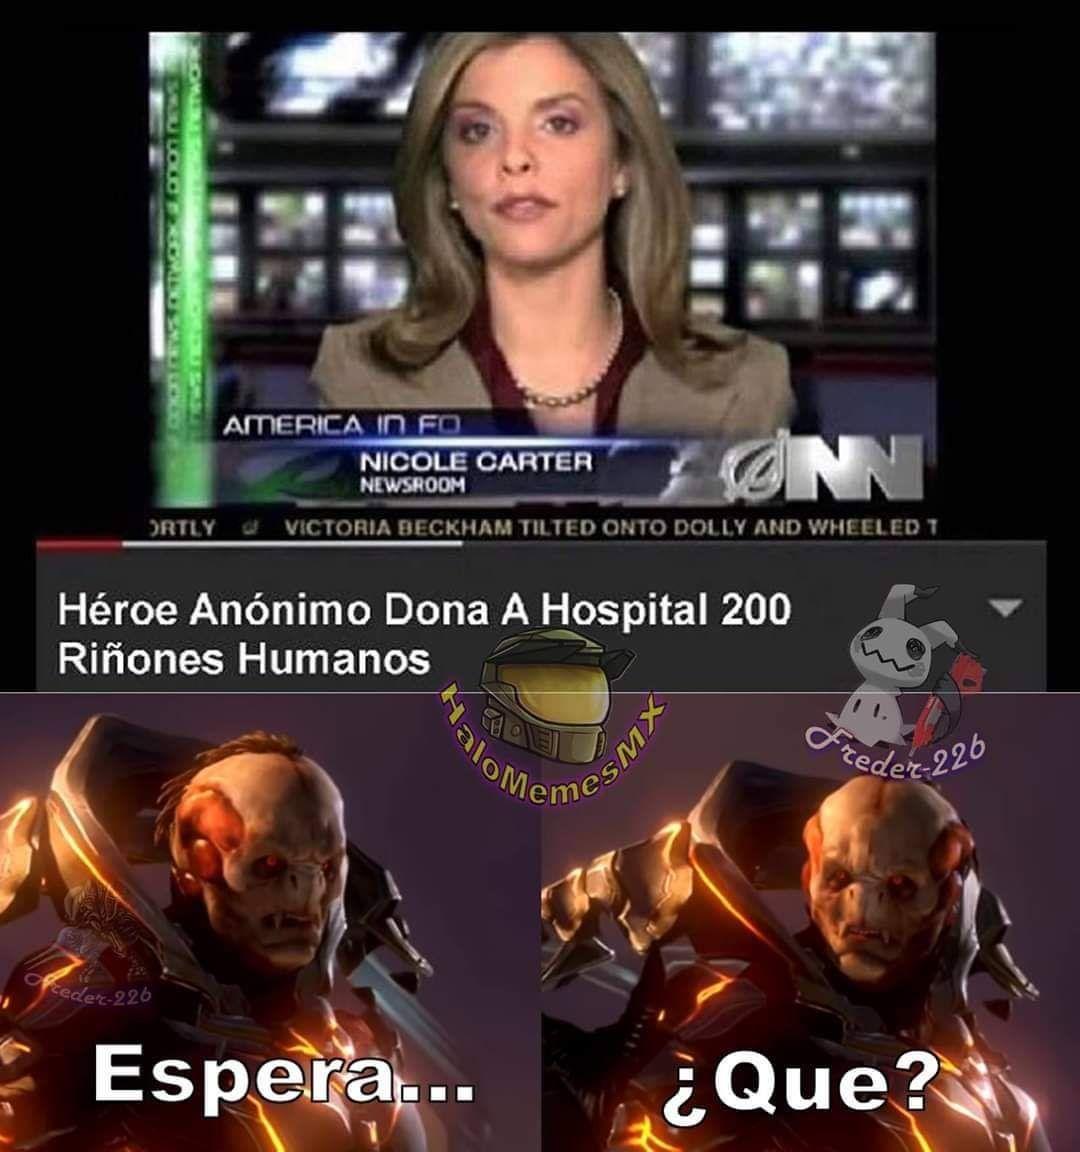 Herói anônimo doa 200 rins humanos a hospital - meme